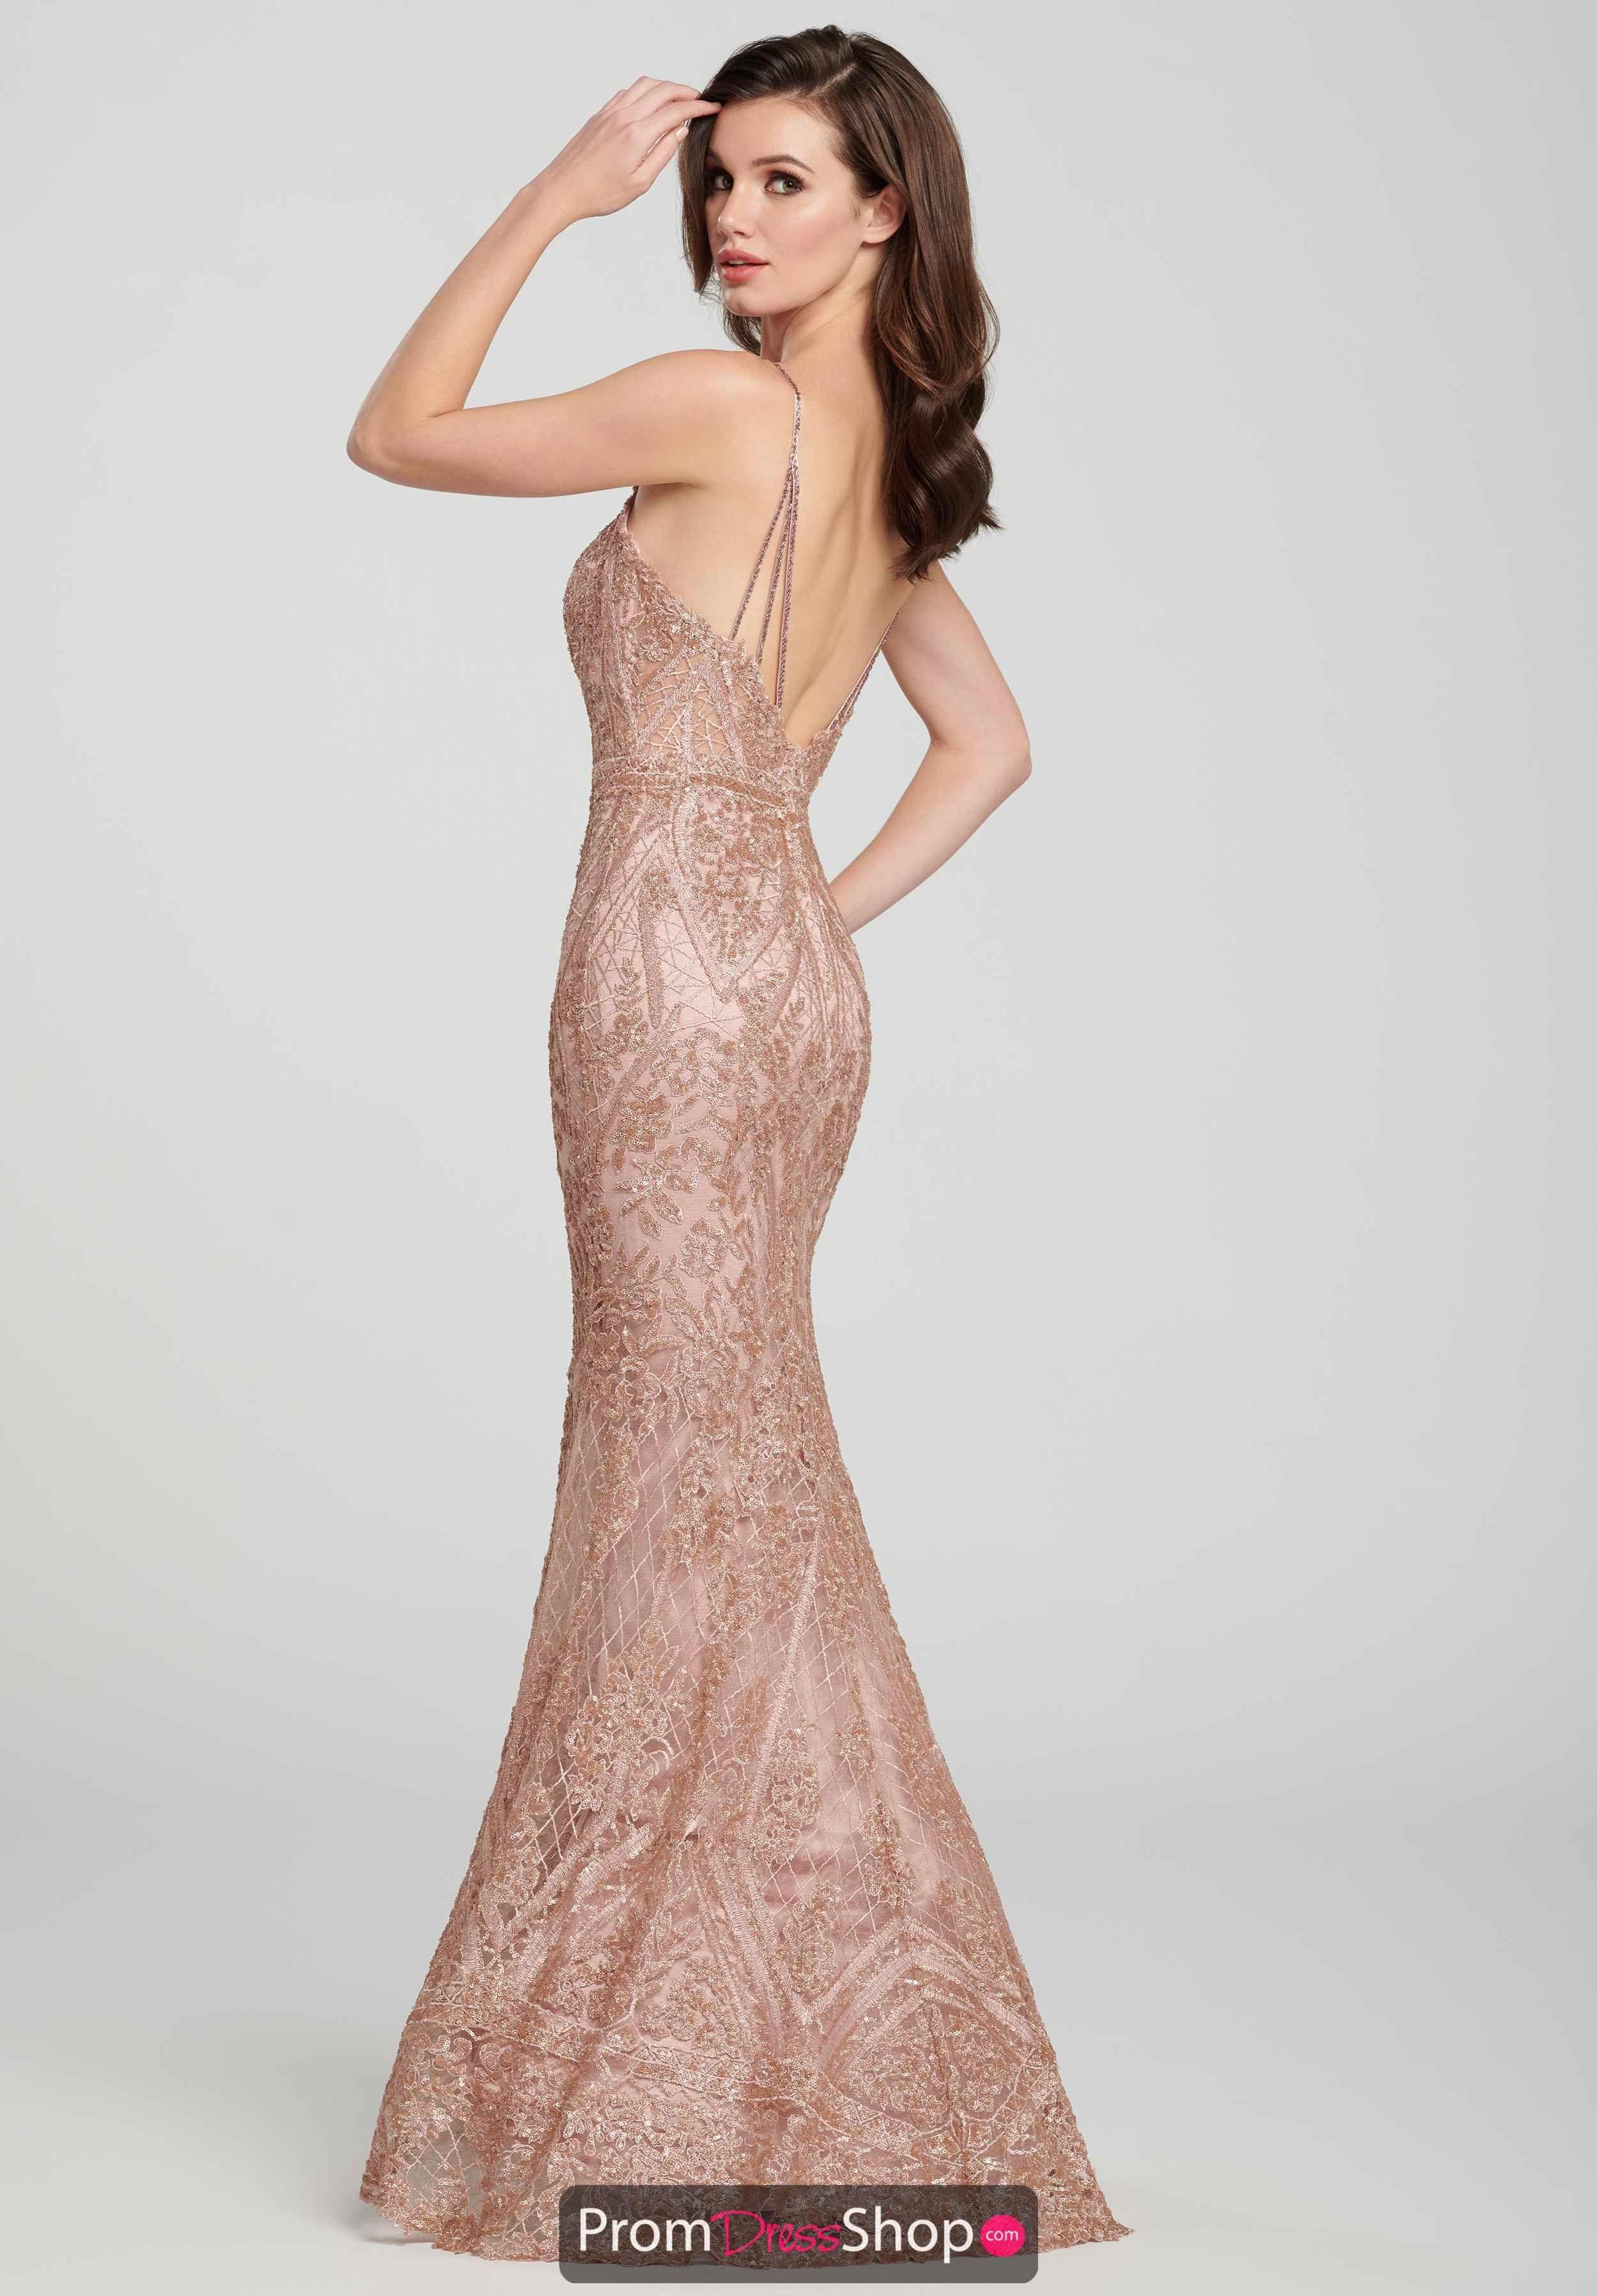 Ellie Wilde Prom Dresses Prom Dresses Ellie Wilde Prom Dresses Rose Gold Prom Dress [ 3594 x 2500 Pixel ]